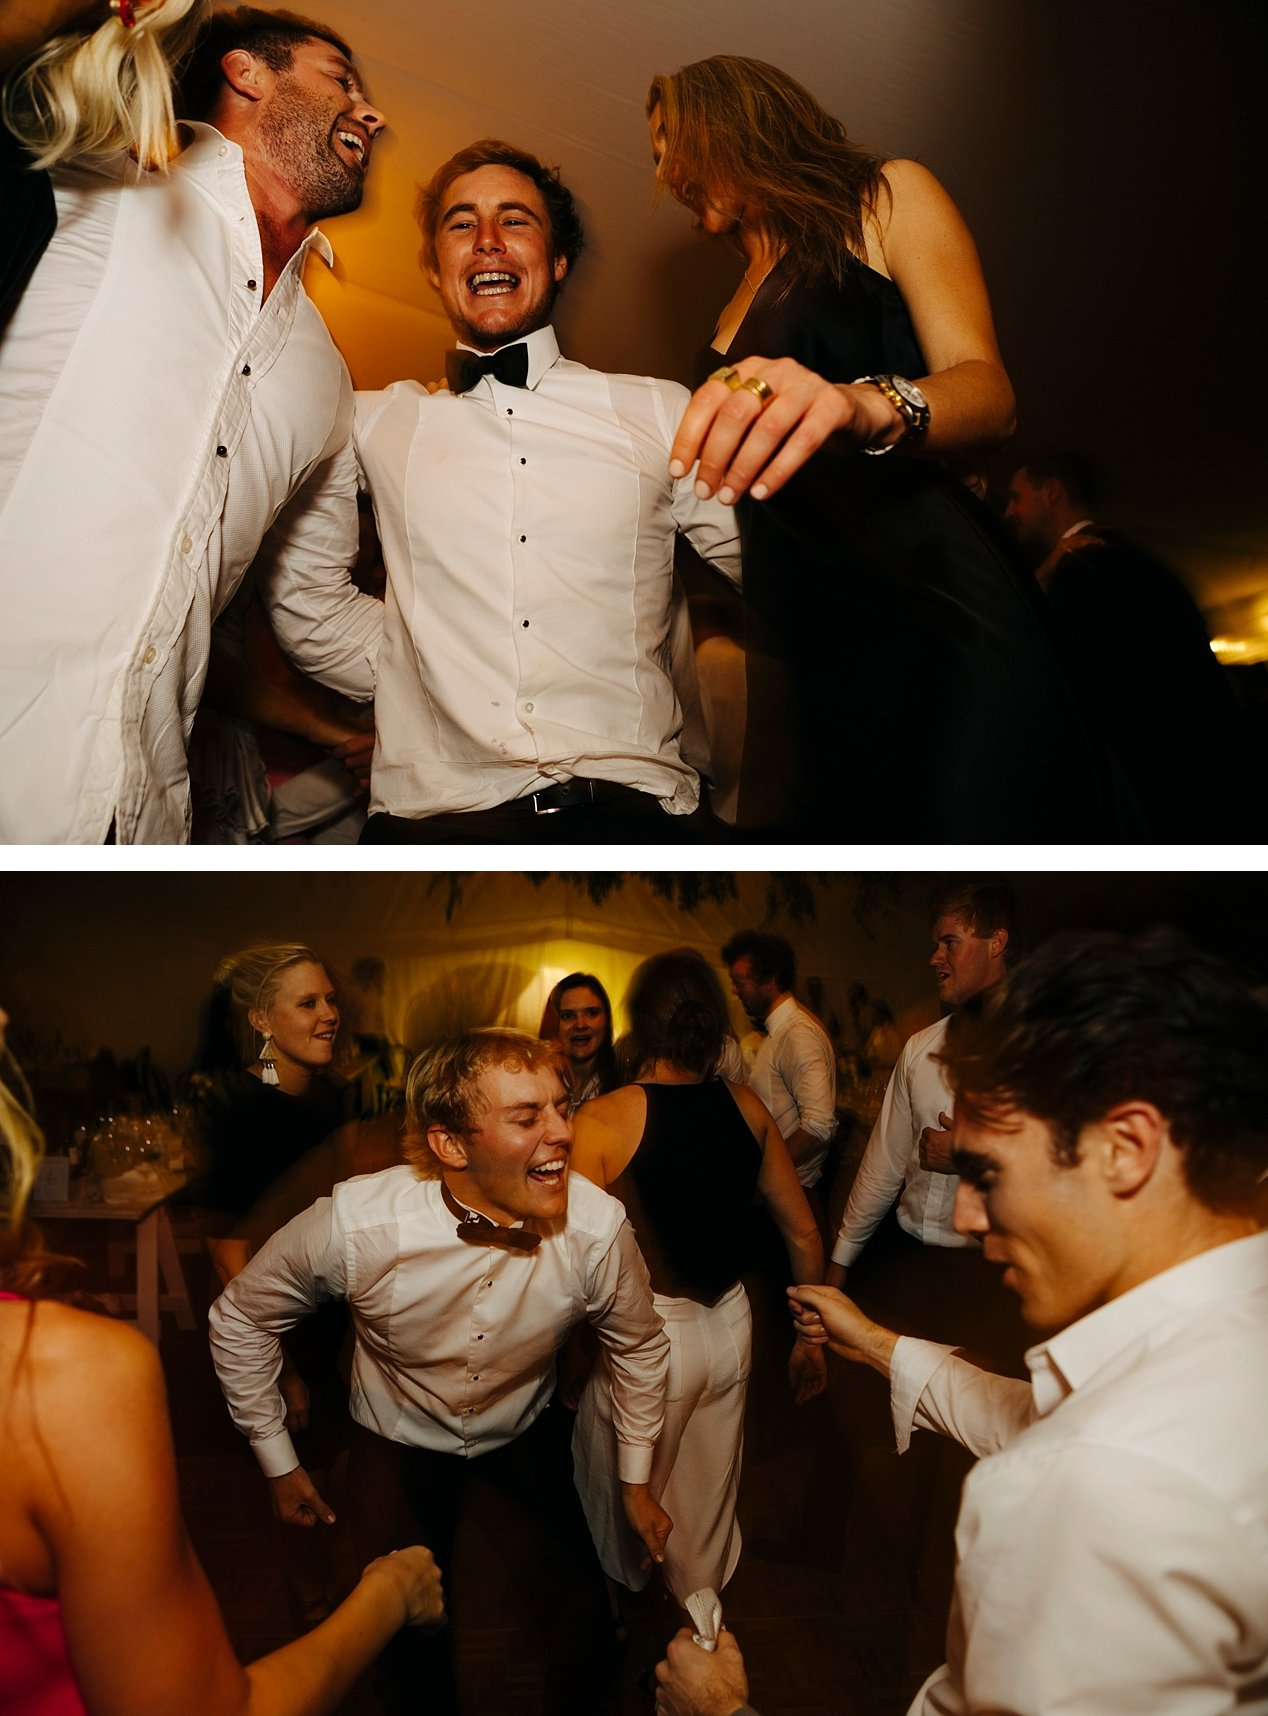 Jerilderie Wedding by Wagga Wagga Wedding Photographer Peppermint Studios_Deniliquin weddings_0084